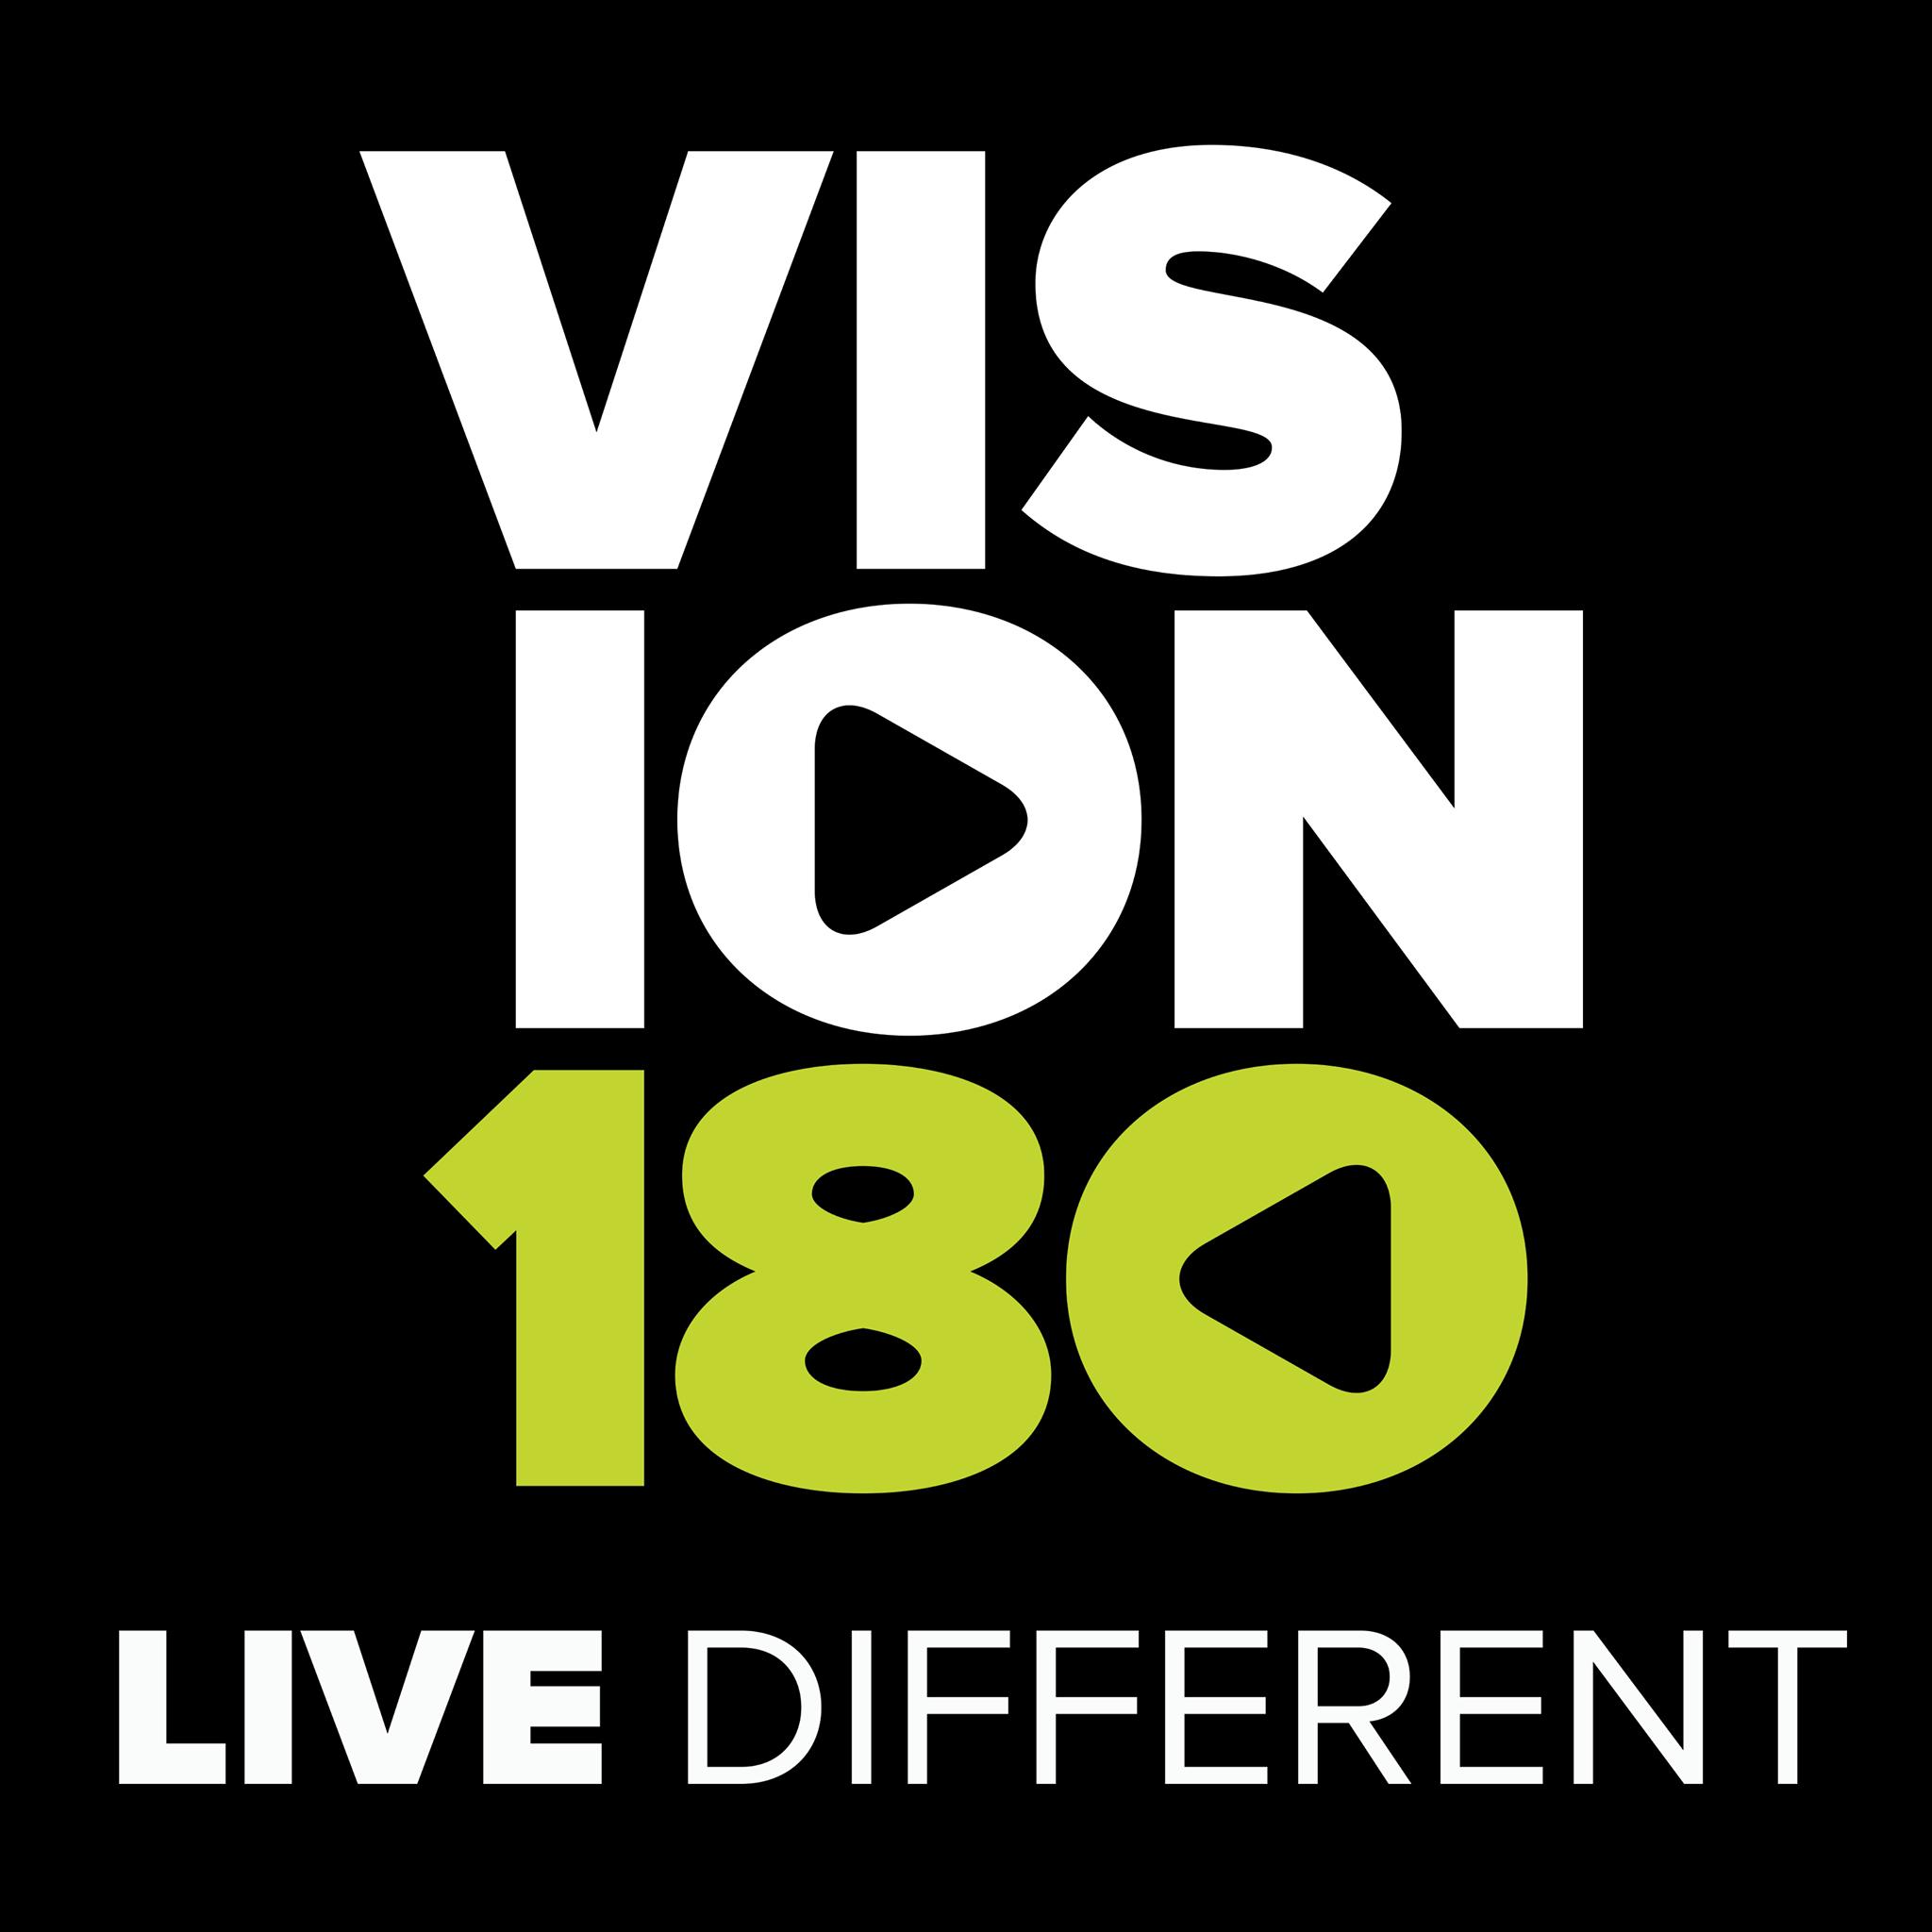 Радио Vision Christian Radio - Vision180 Австралия, Сидней